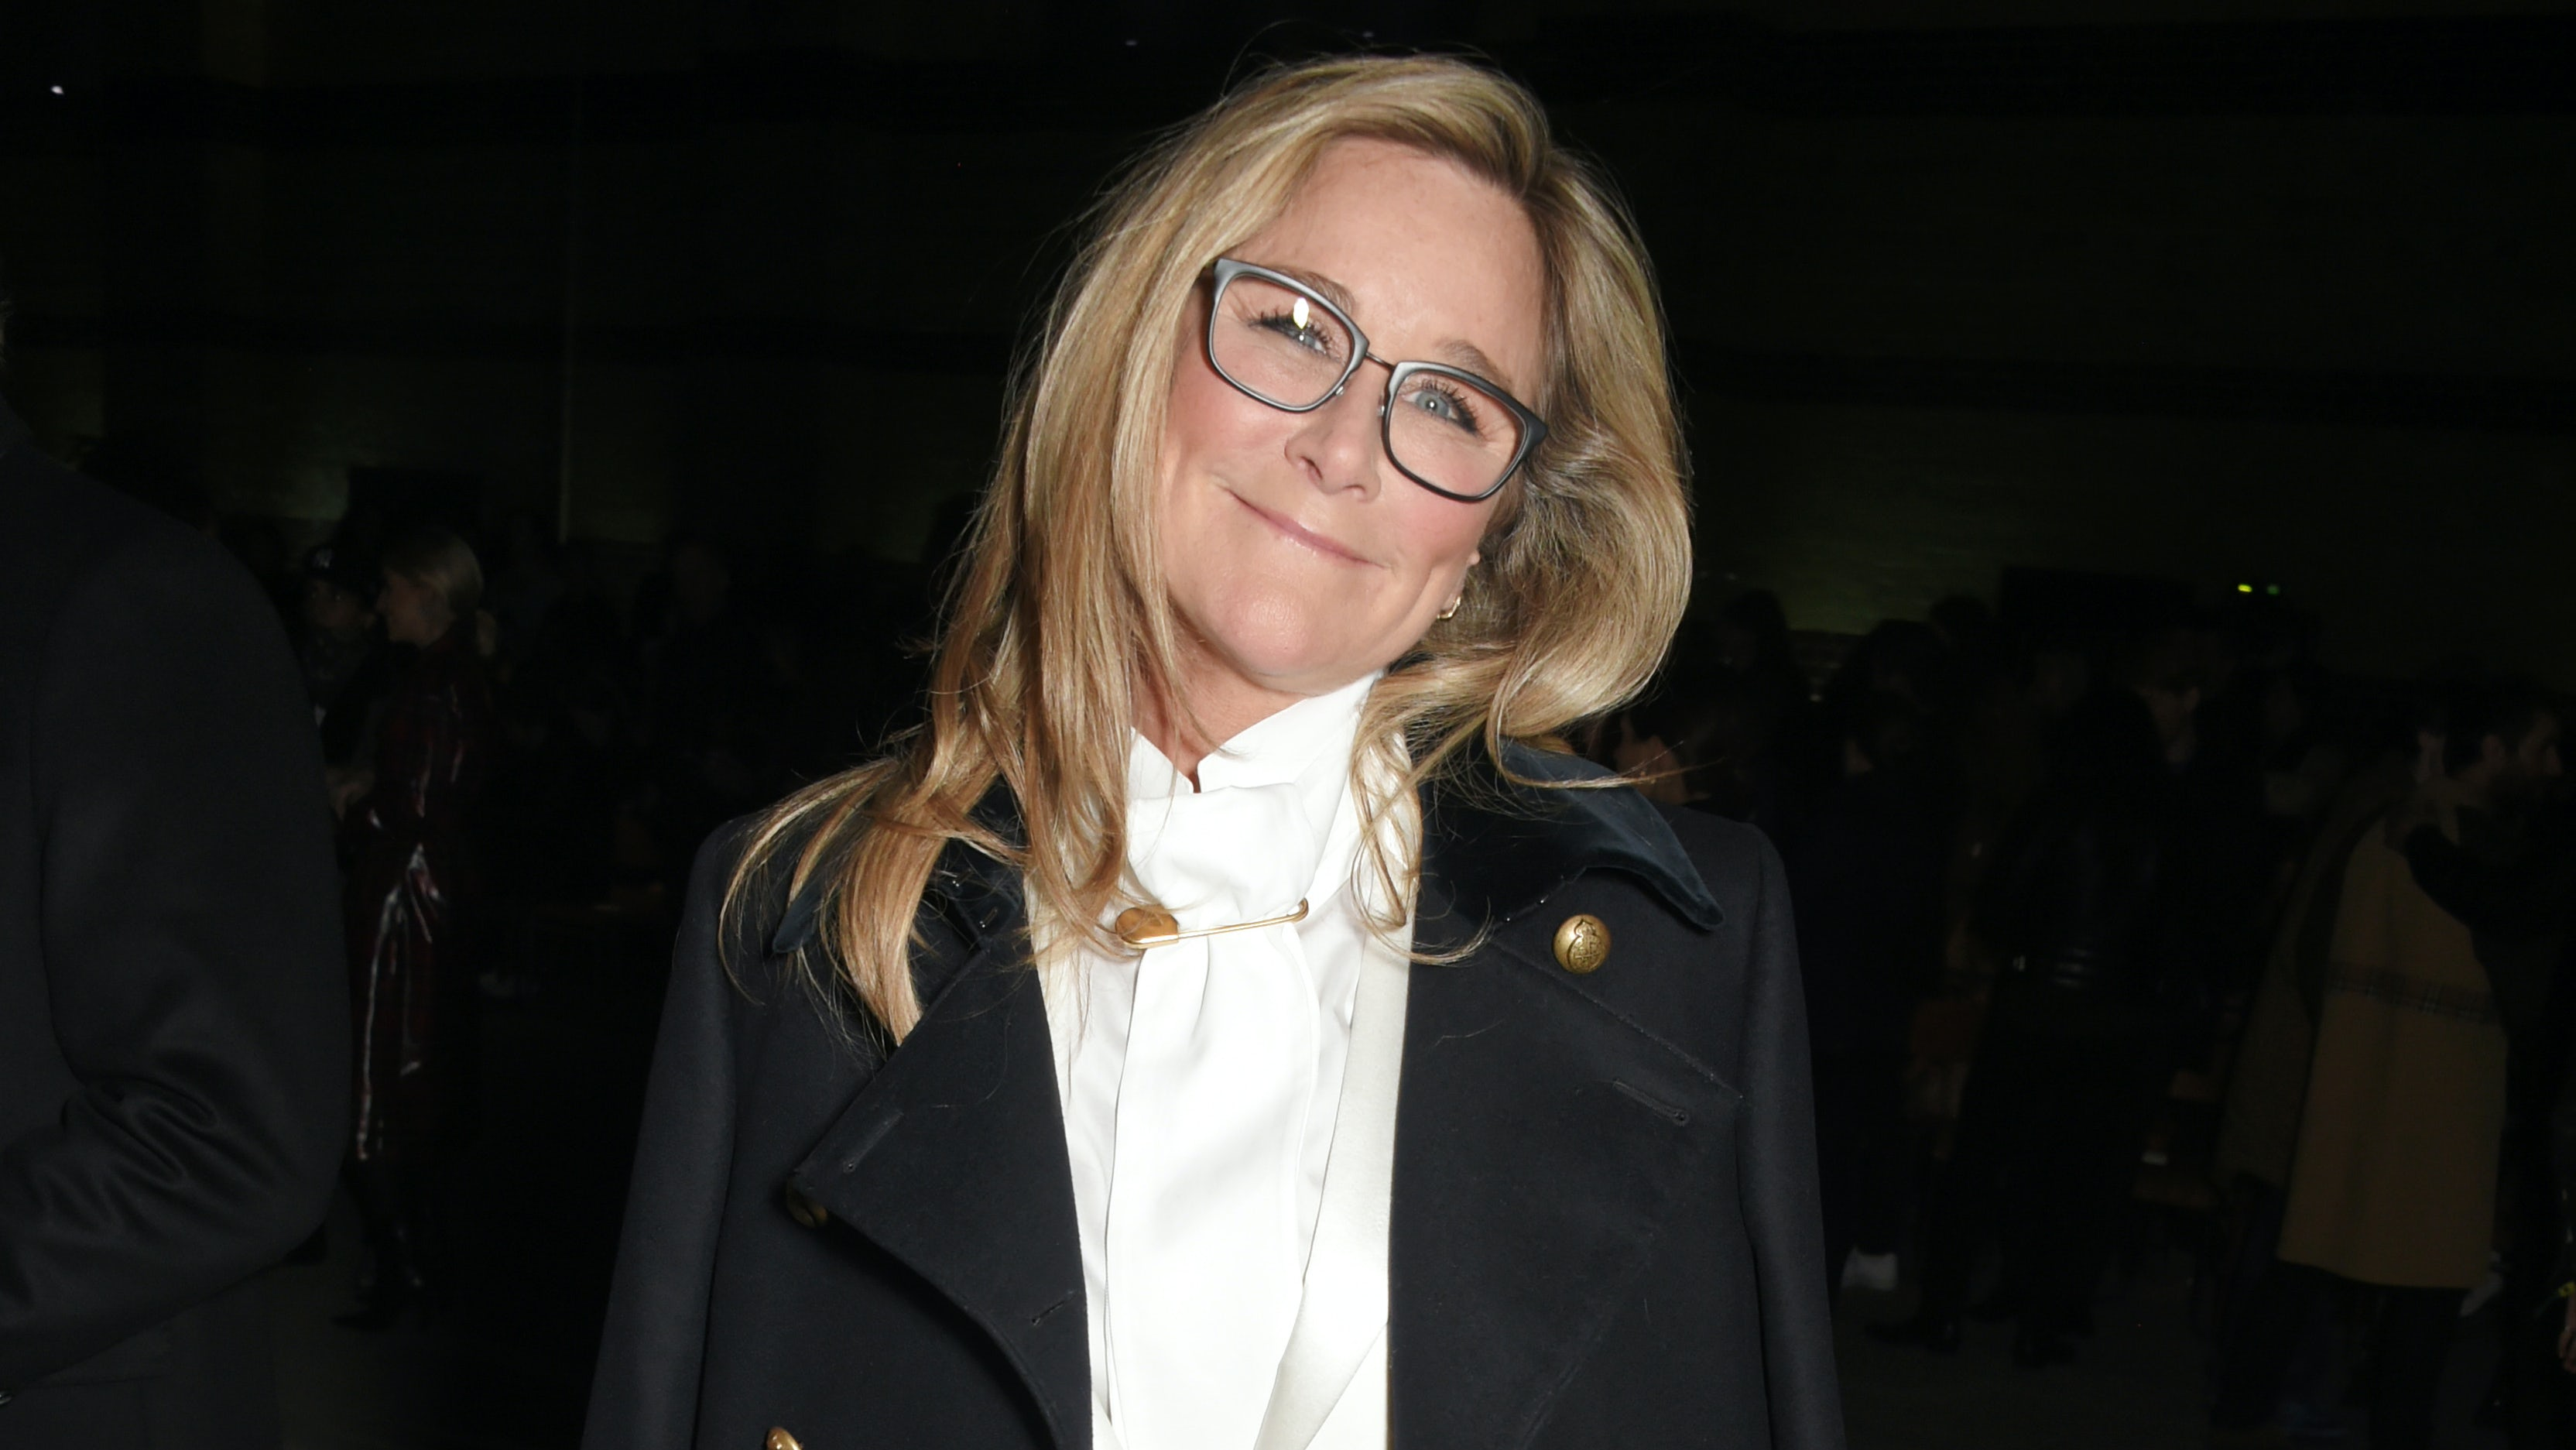 Angela Ahrendts in 2018 | Source: David M. Benett/Getty Images